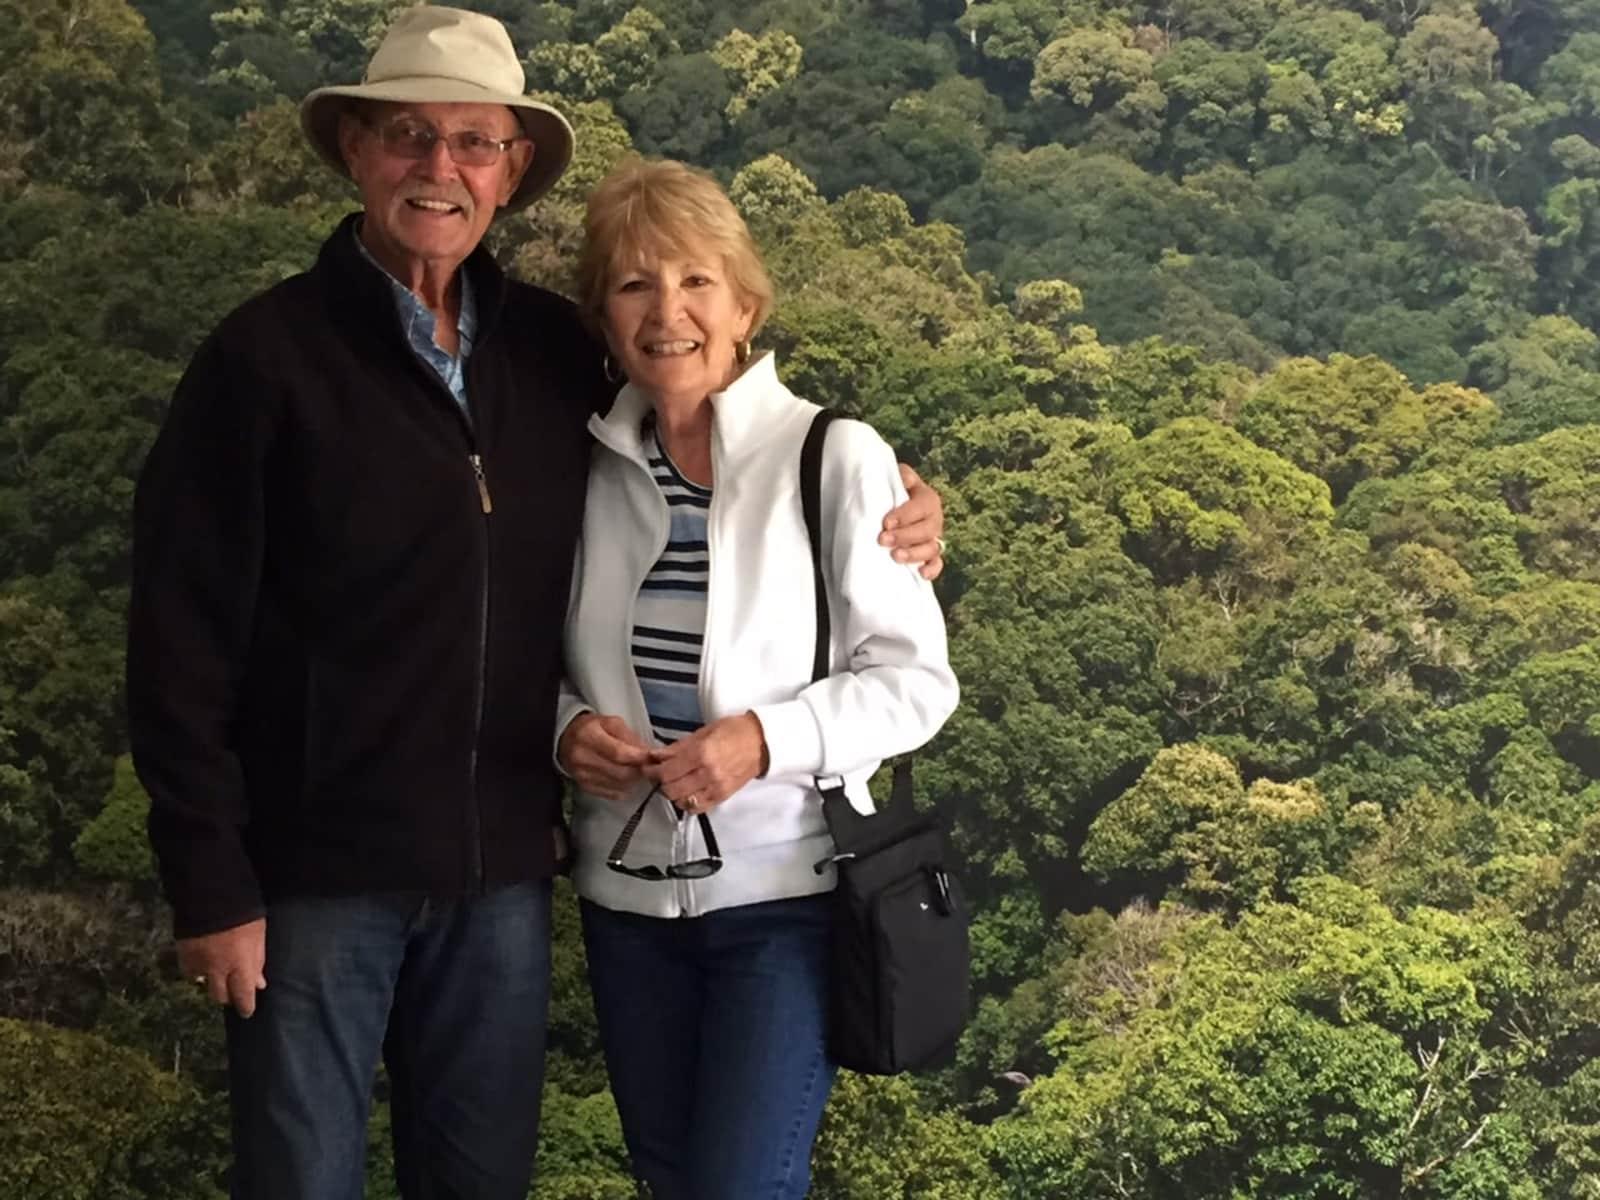 Doug & Cheryl from Orillia, Ontario, Canada